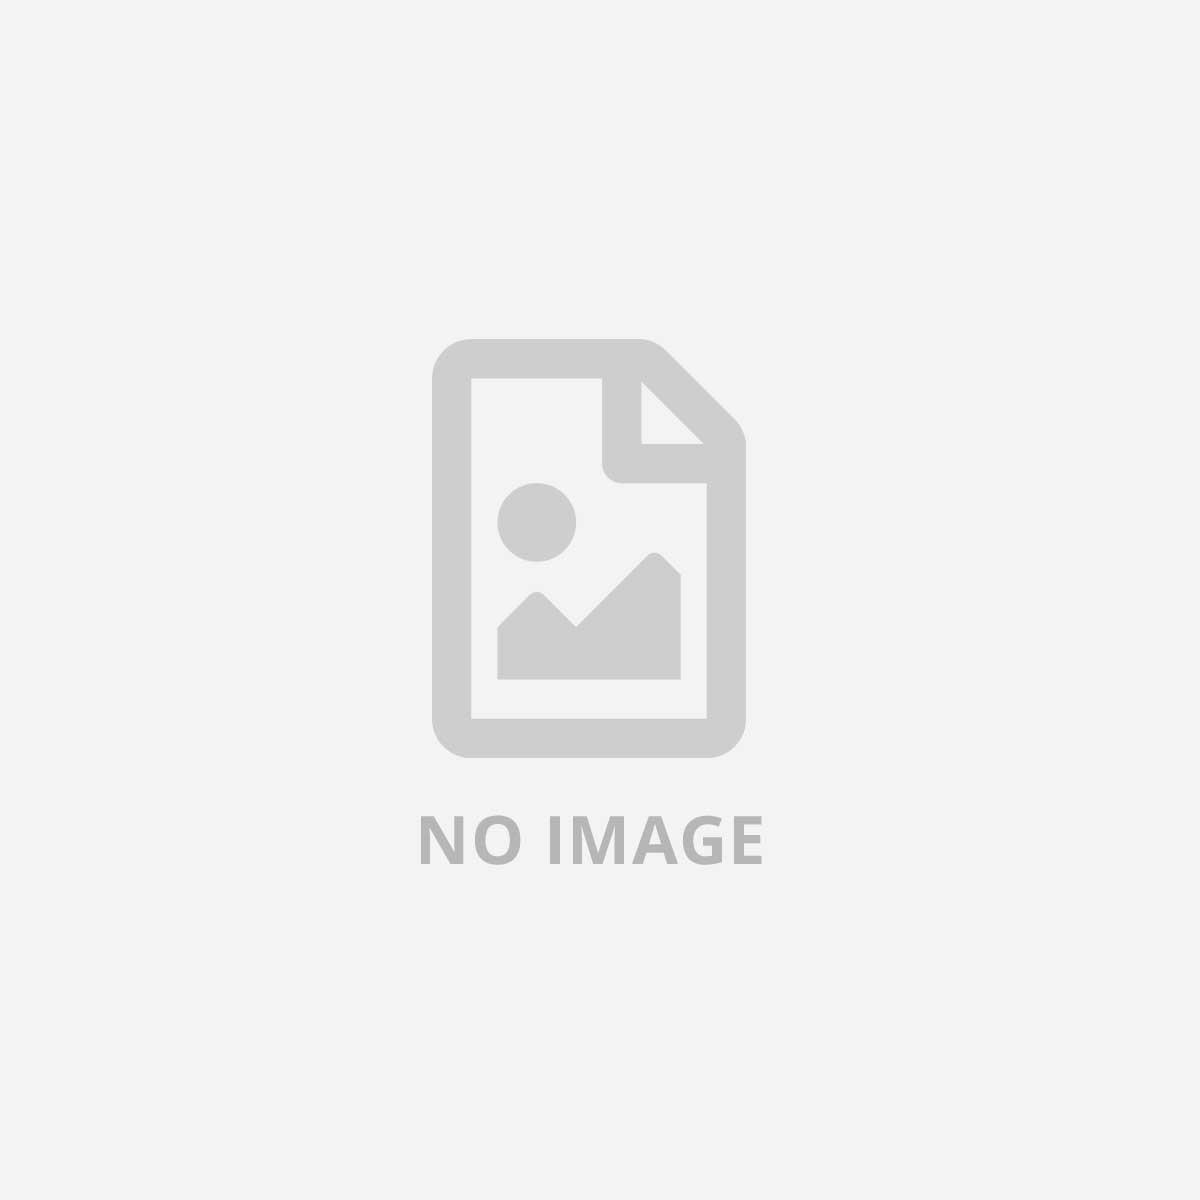 TESABASIC 19X33M IN FLAWPACK